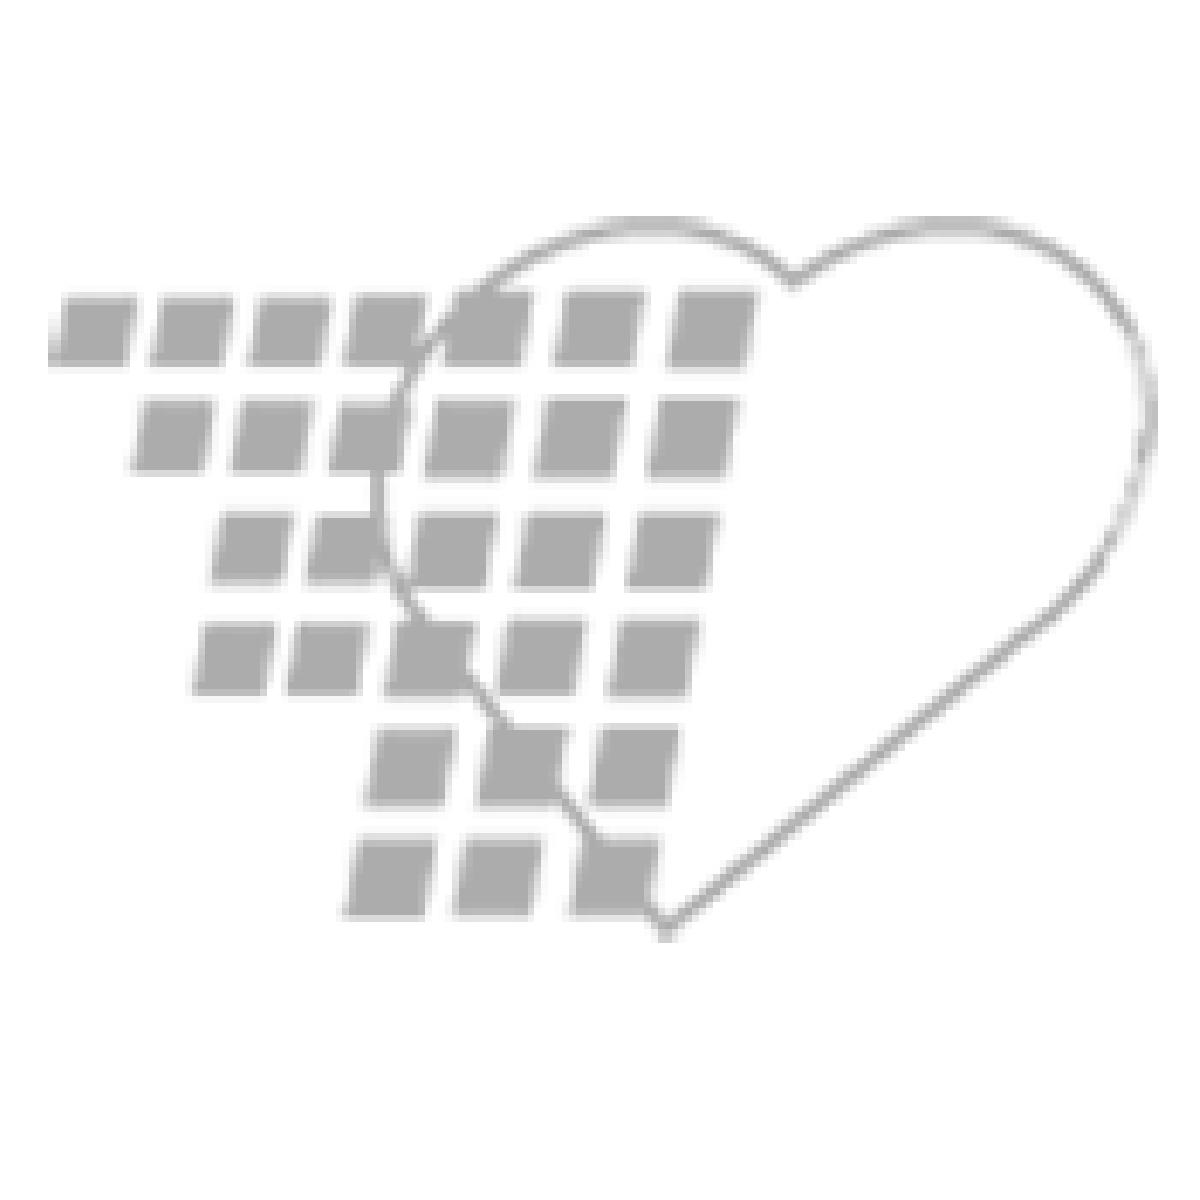 14-17-0028 Simulaids Xtreme Trauma Deluxe Moulage Kit